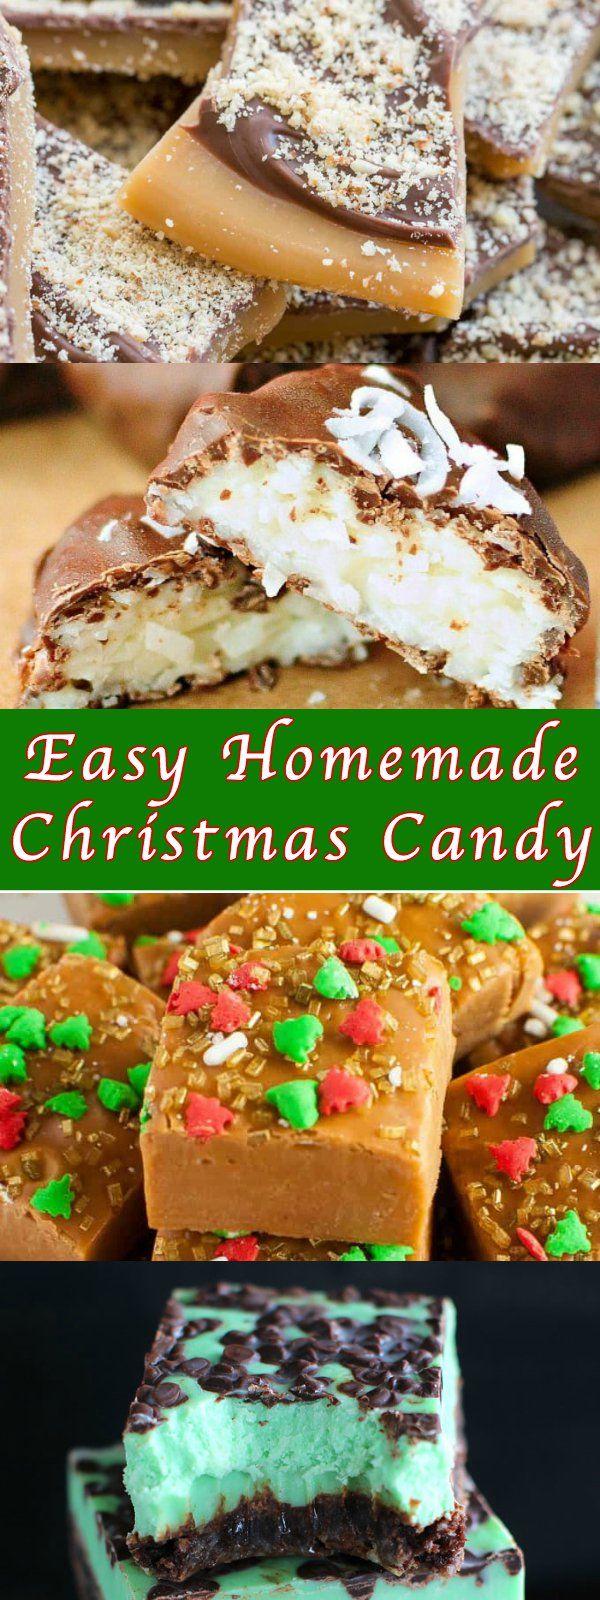 Easy Homemade Christmas Candy